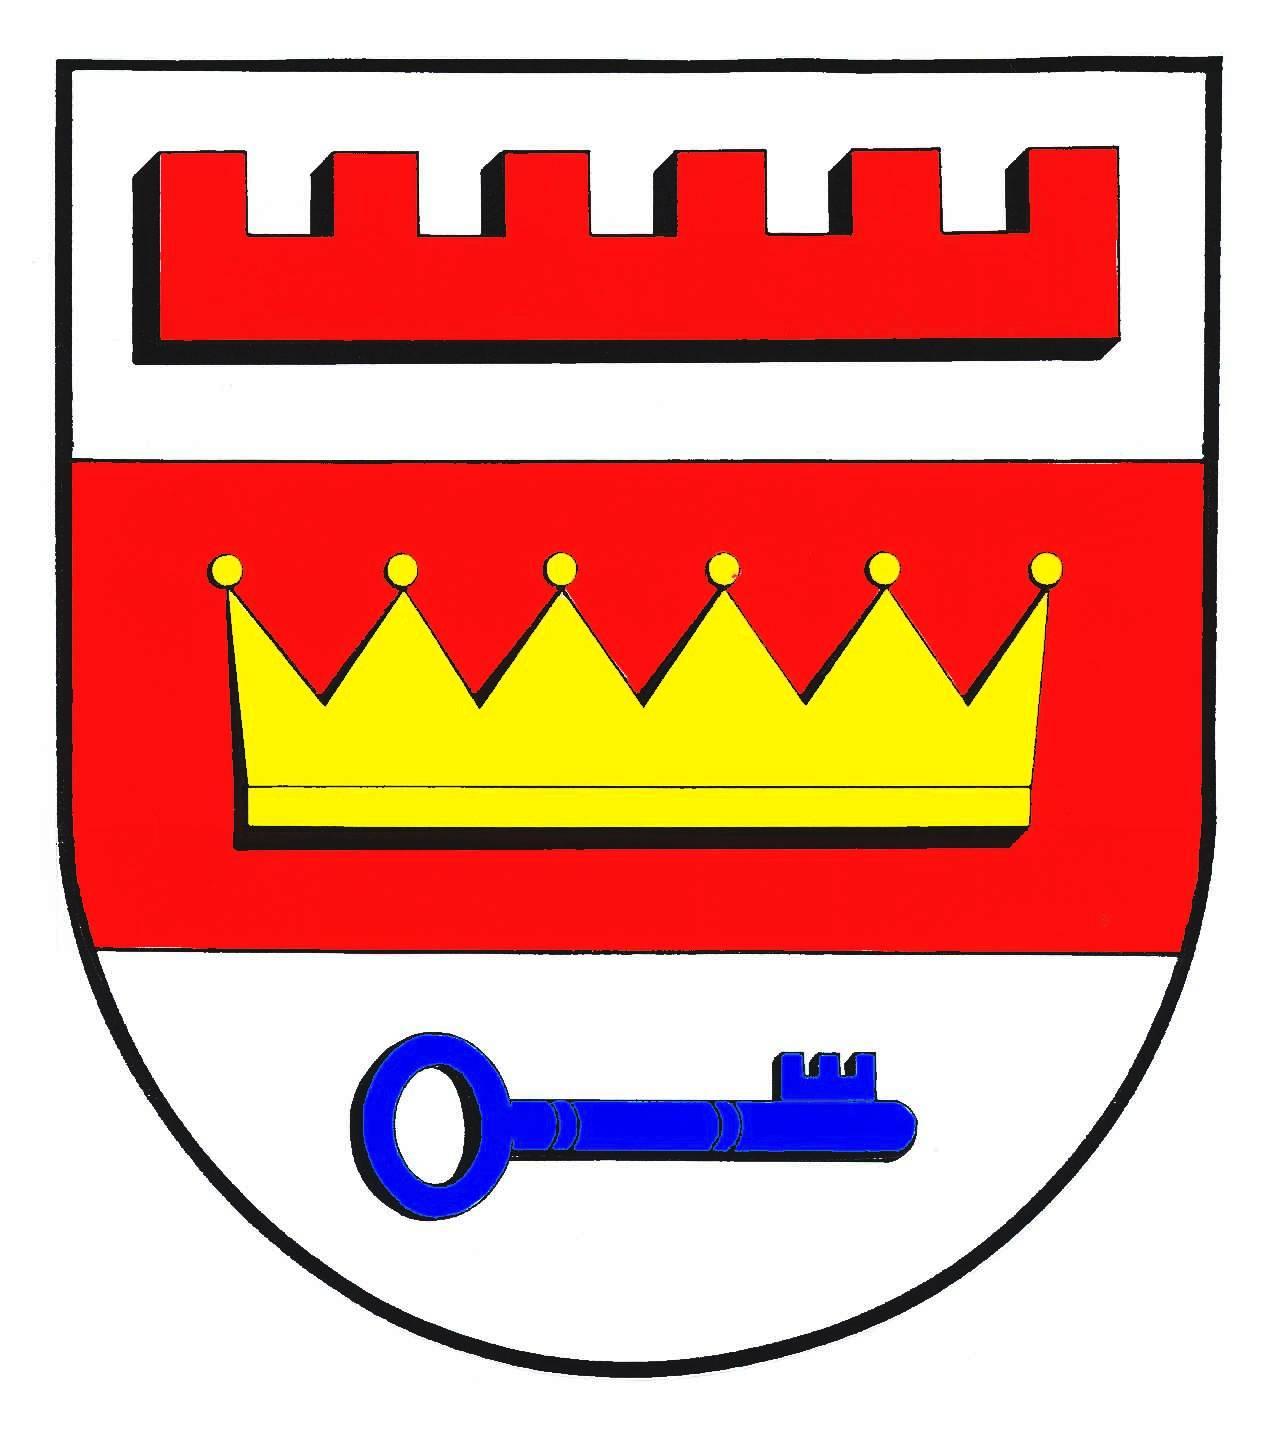 Wappen GemeindeTappendorf, Kreis Rendsburg-Eckernförde